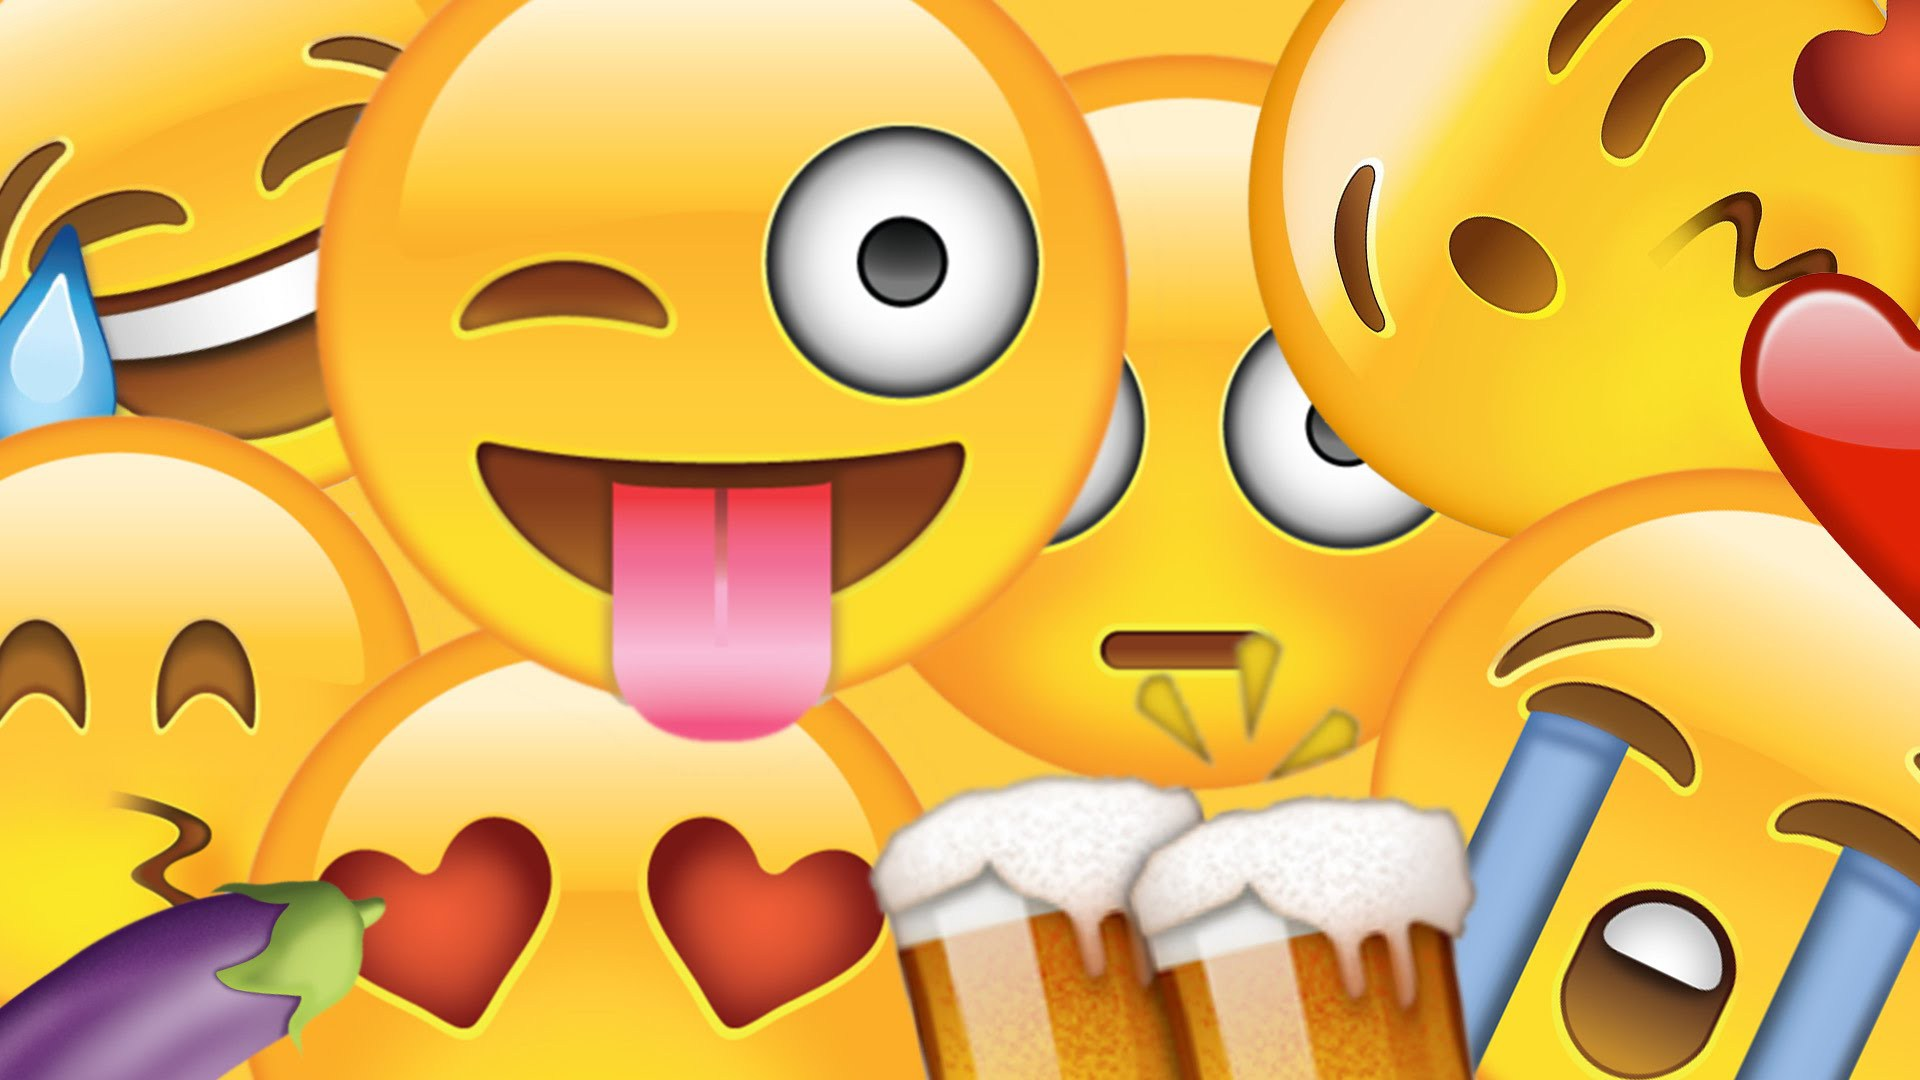 conputer tumblr emoji wallpaper - photo #46